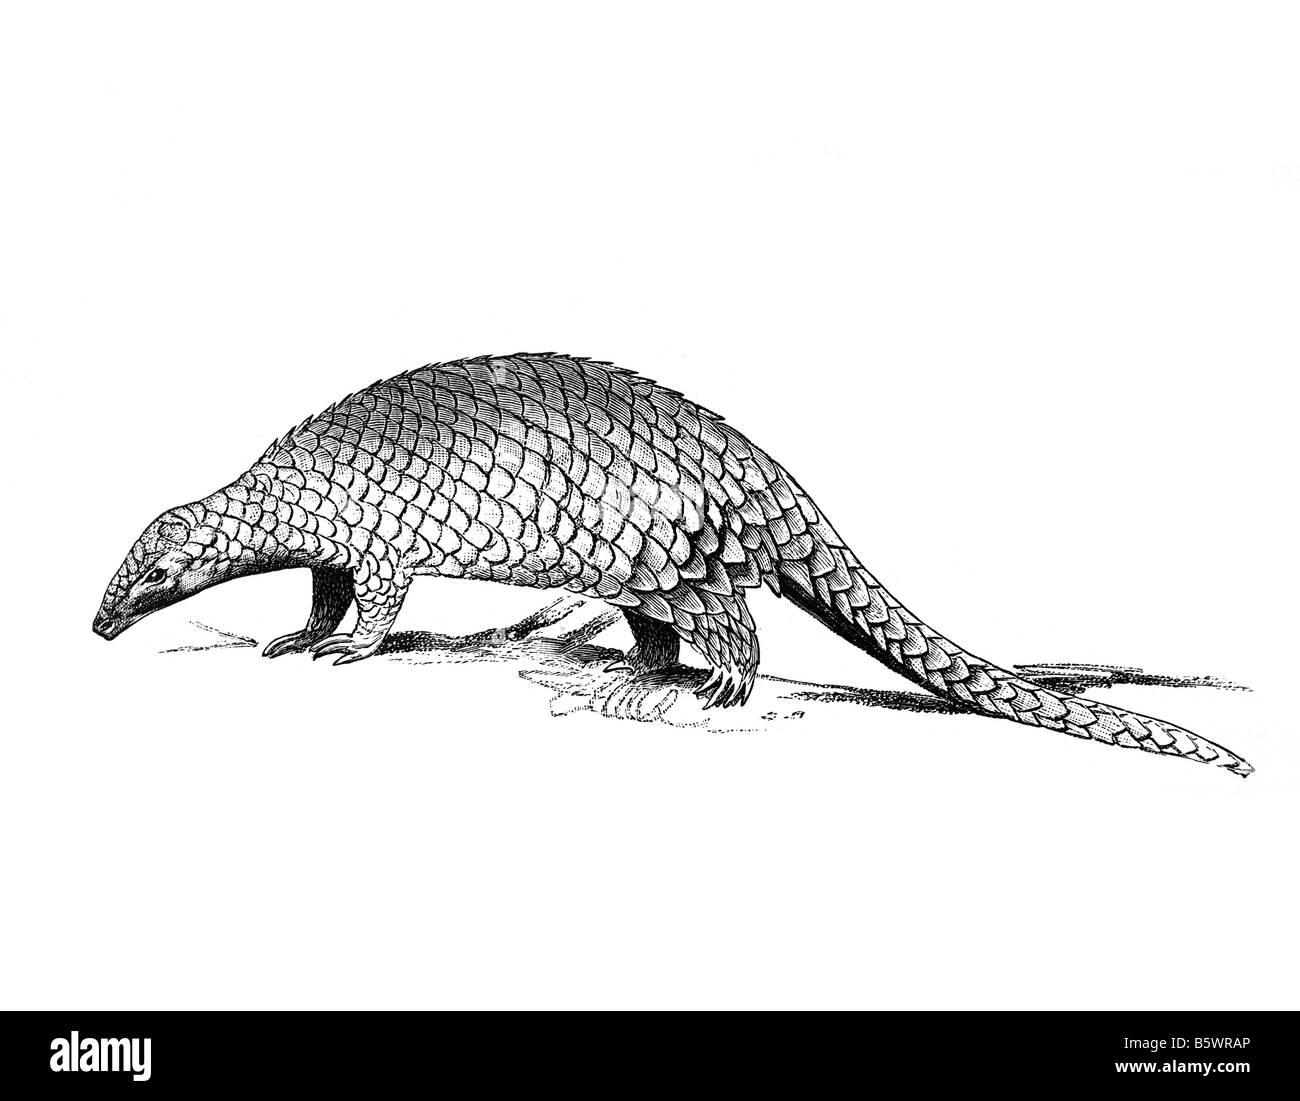 pangolin, pangolins scaly anteaters order Pholidota - Stock Image